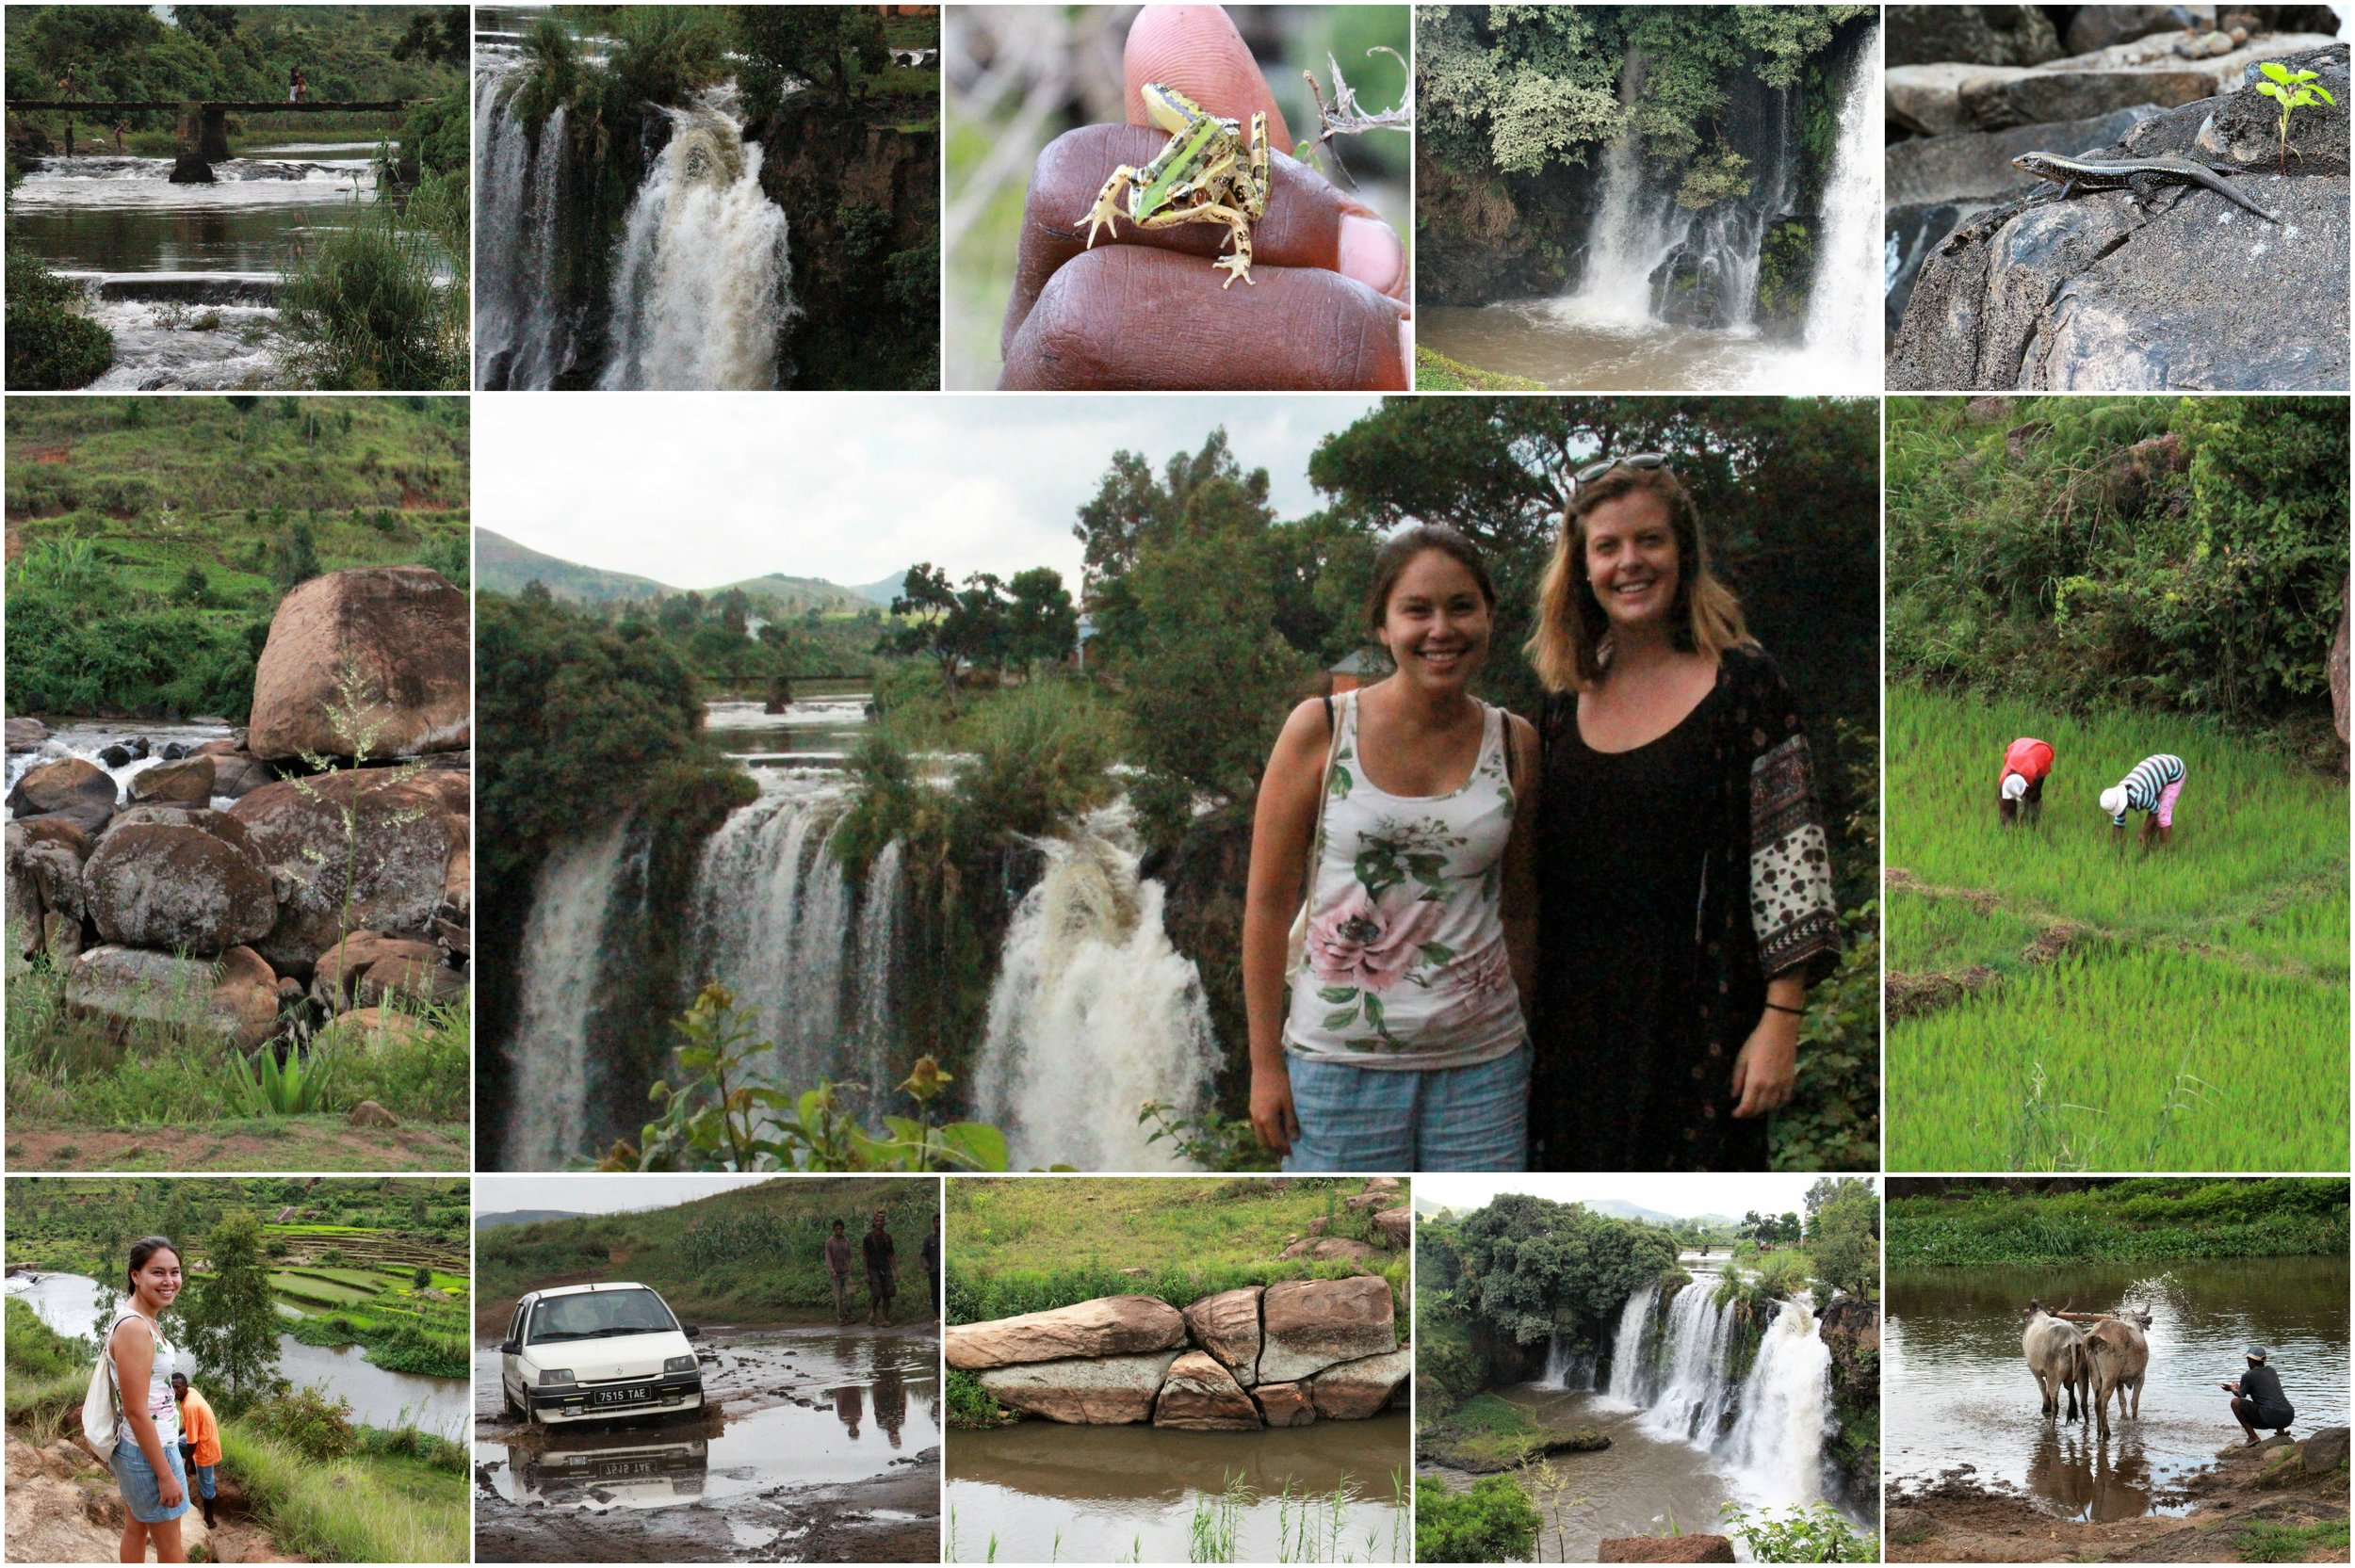 Lily waterfalls